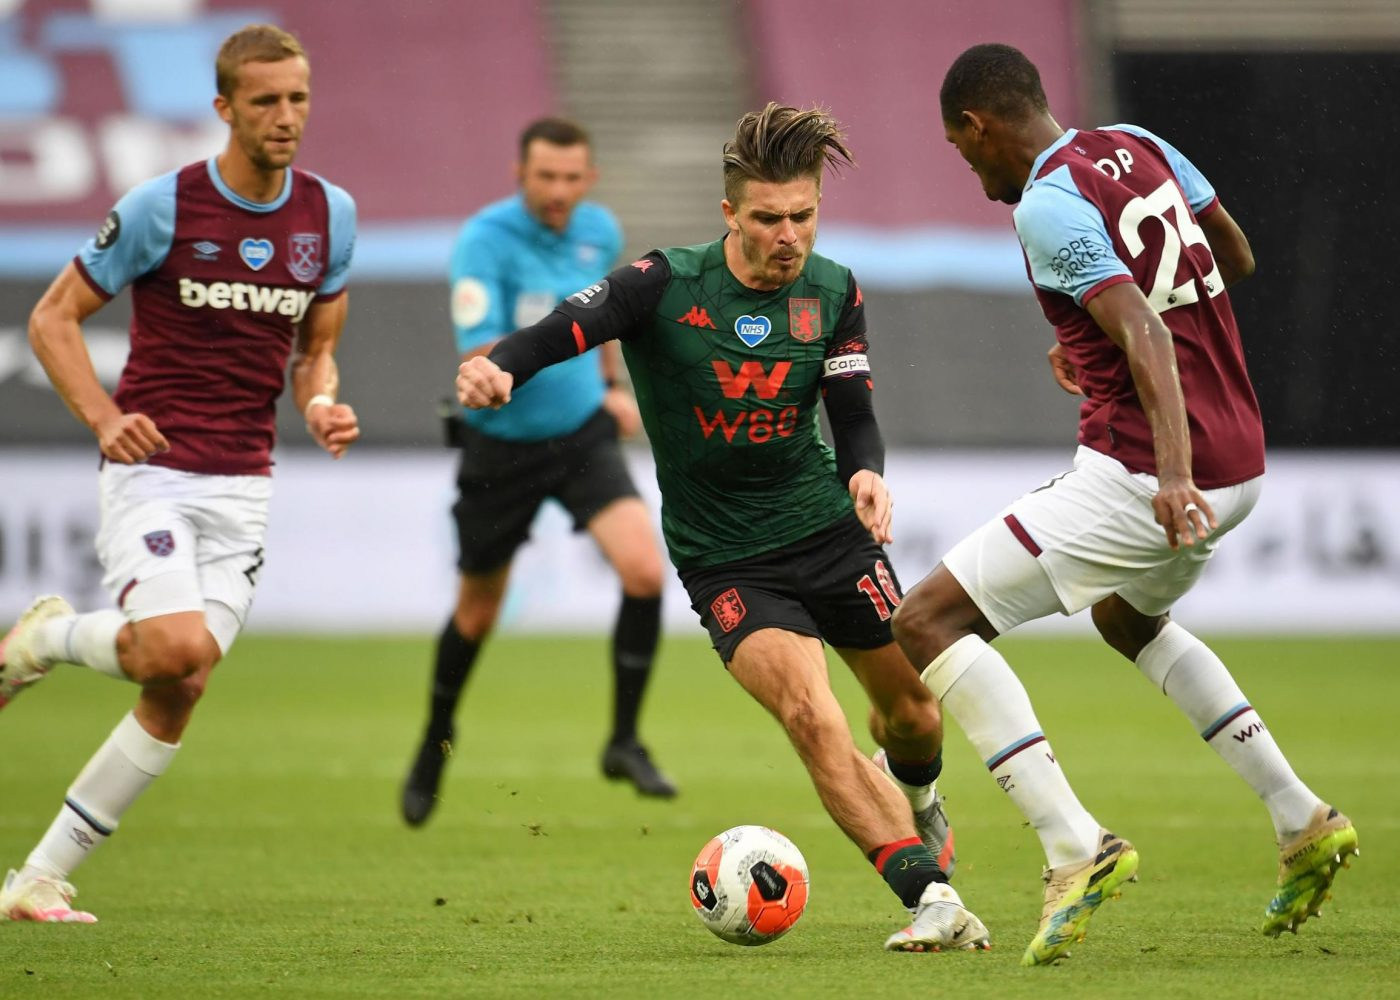 Soi kèo West Ham vs Aston Villa, 03h00 ngày 1/12, Ngoại hạng Anh